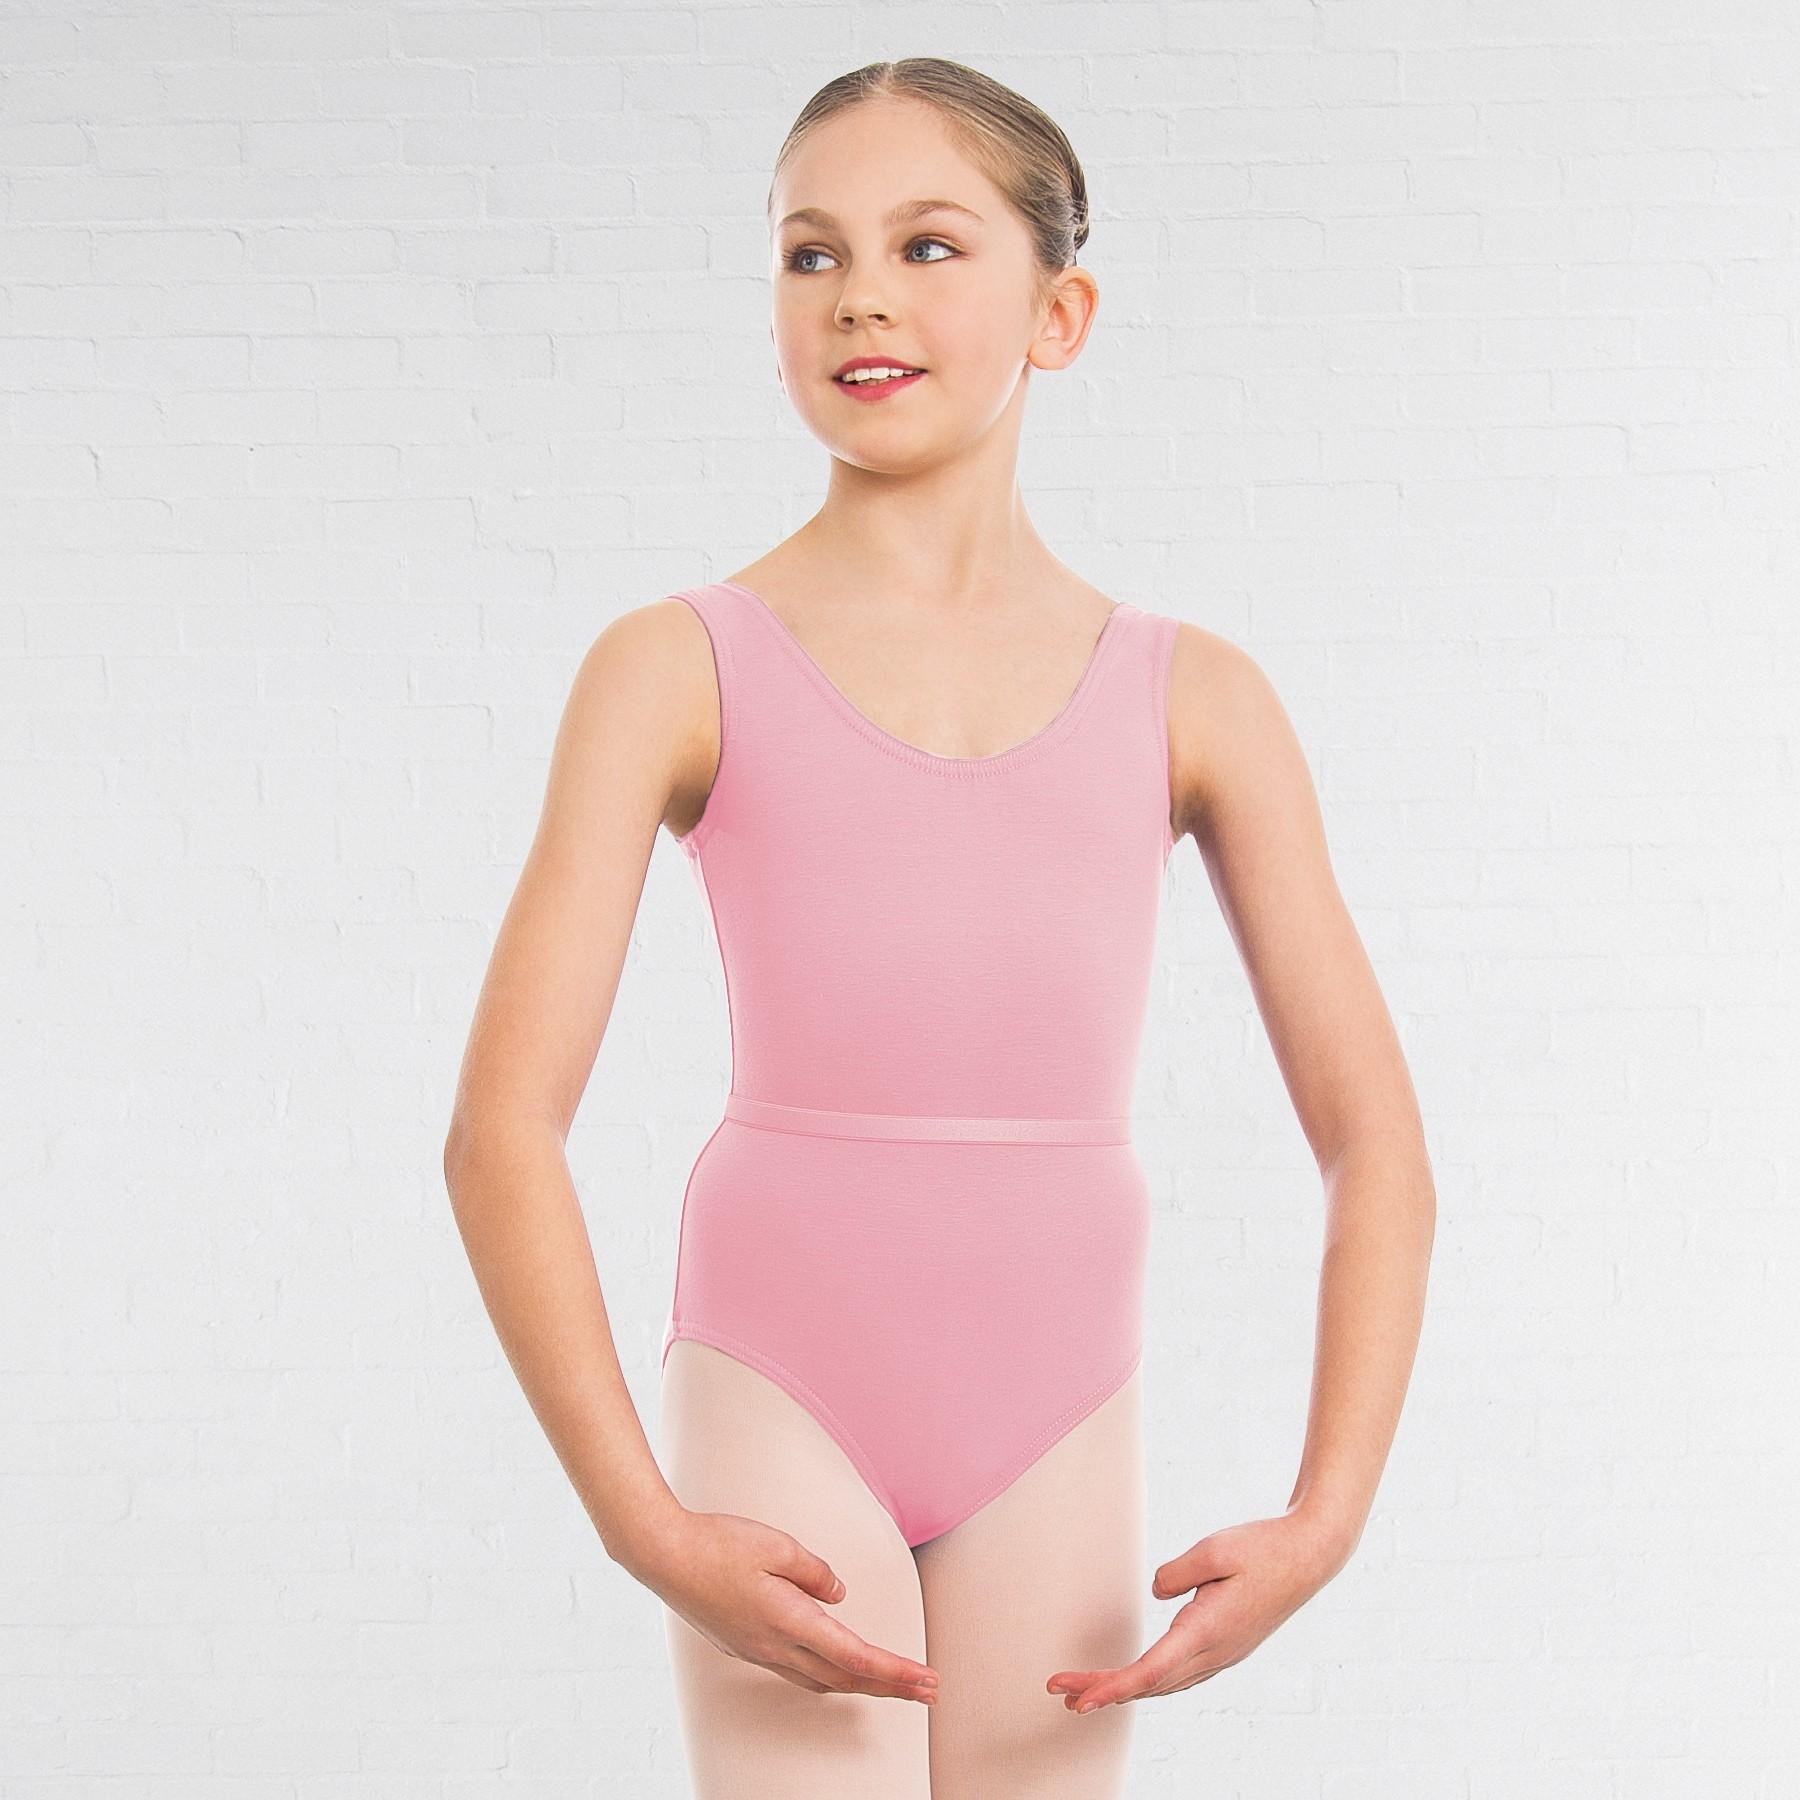 1st Position Laura Grades 1-5 Leotard (Pale Pink)